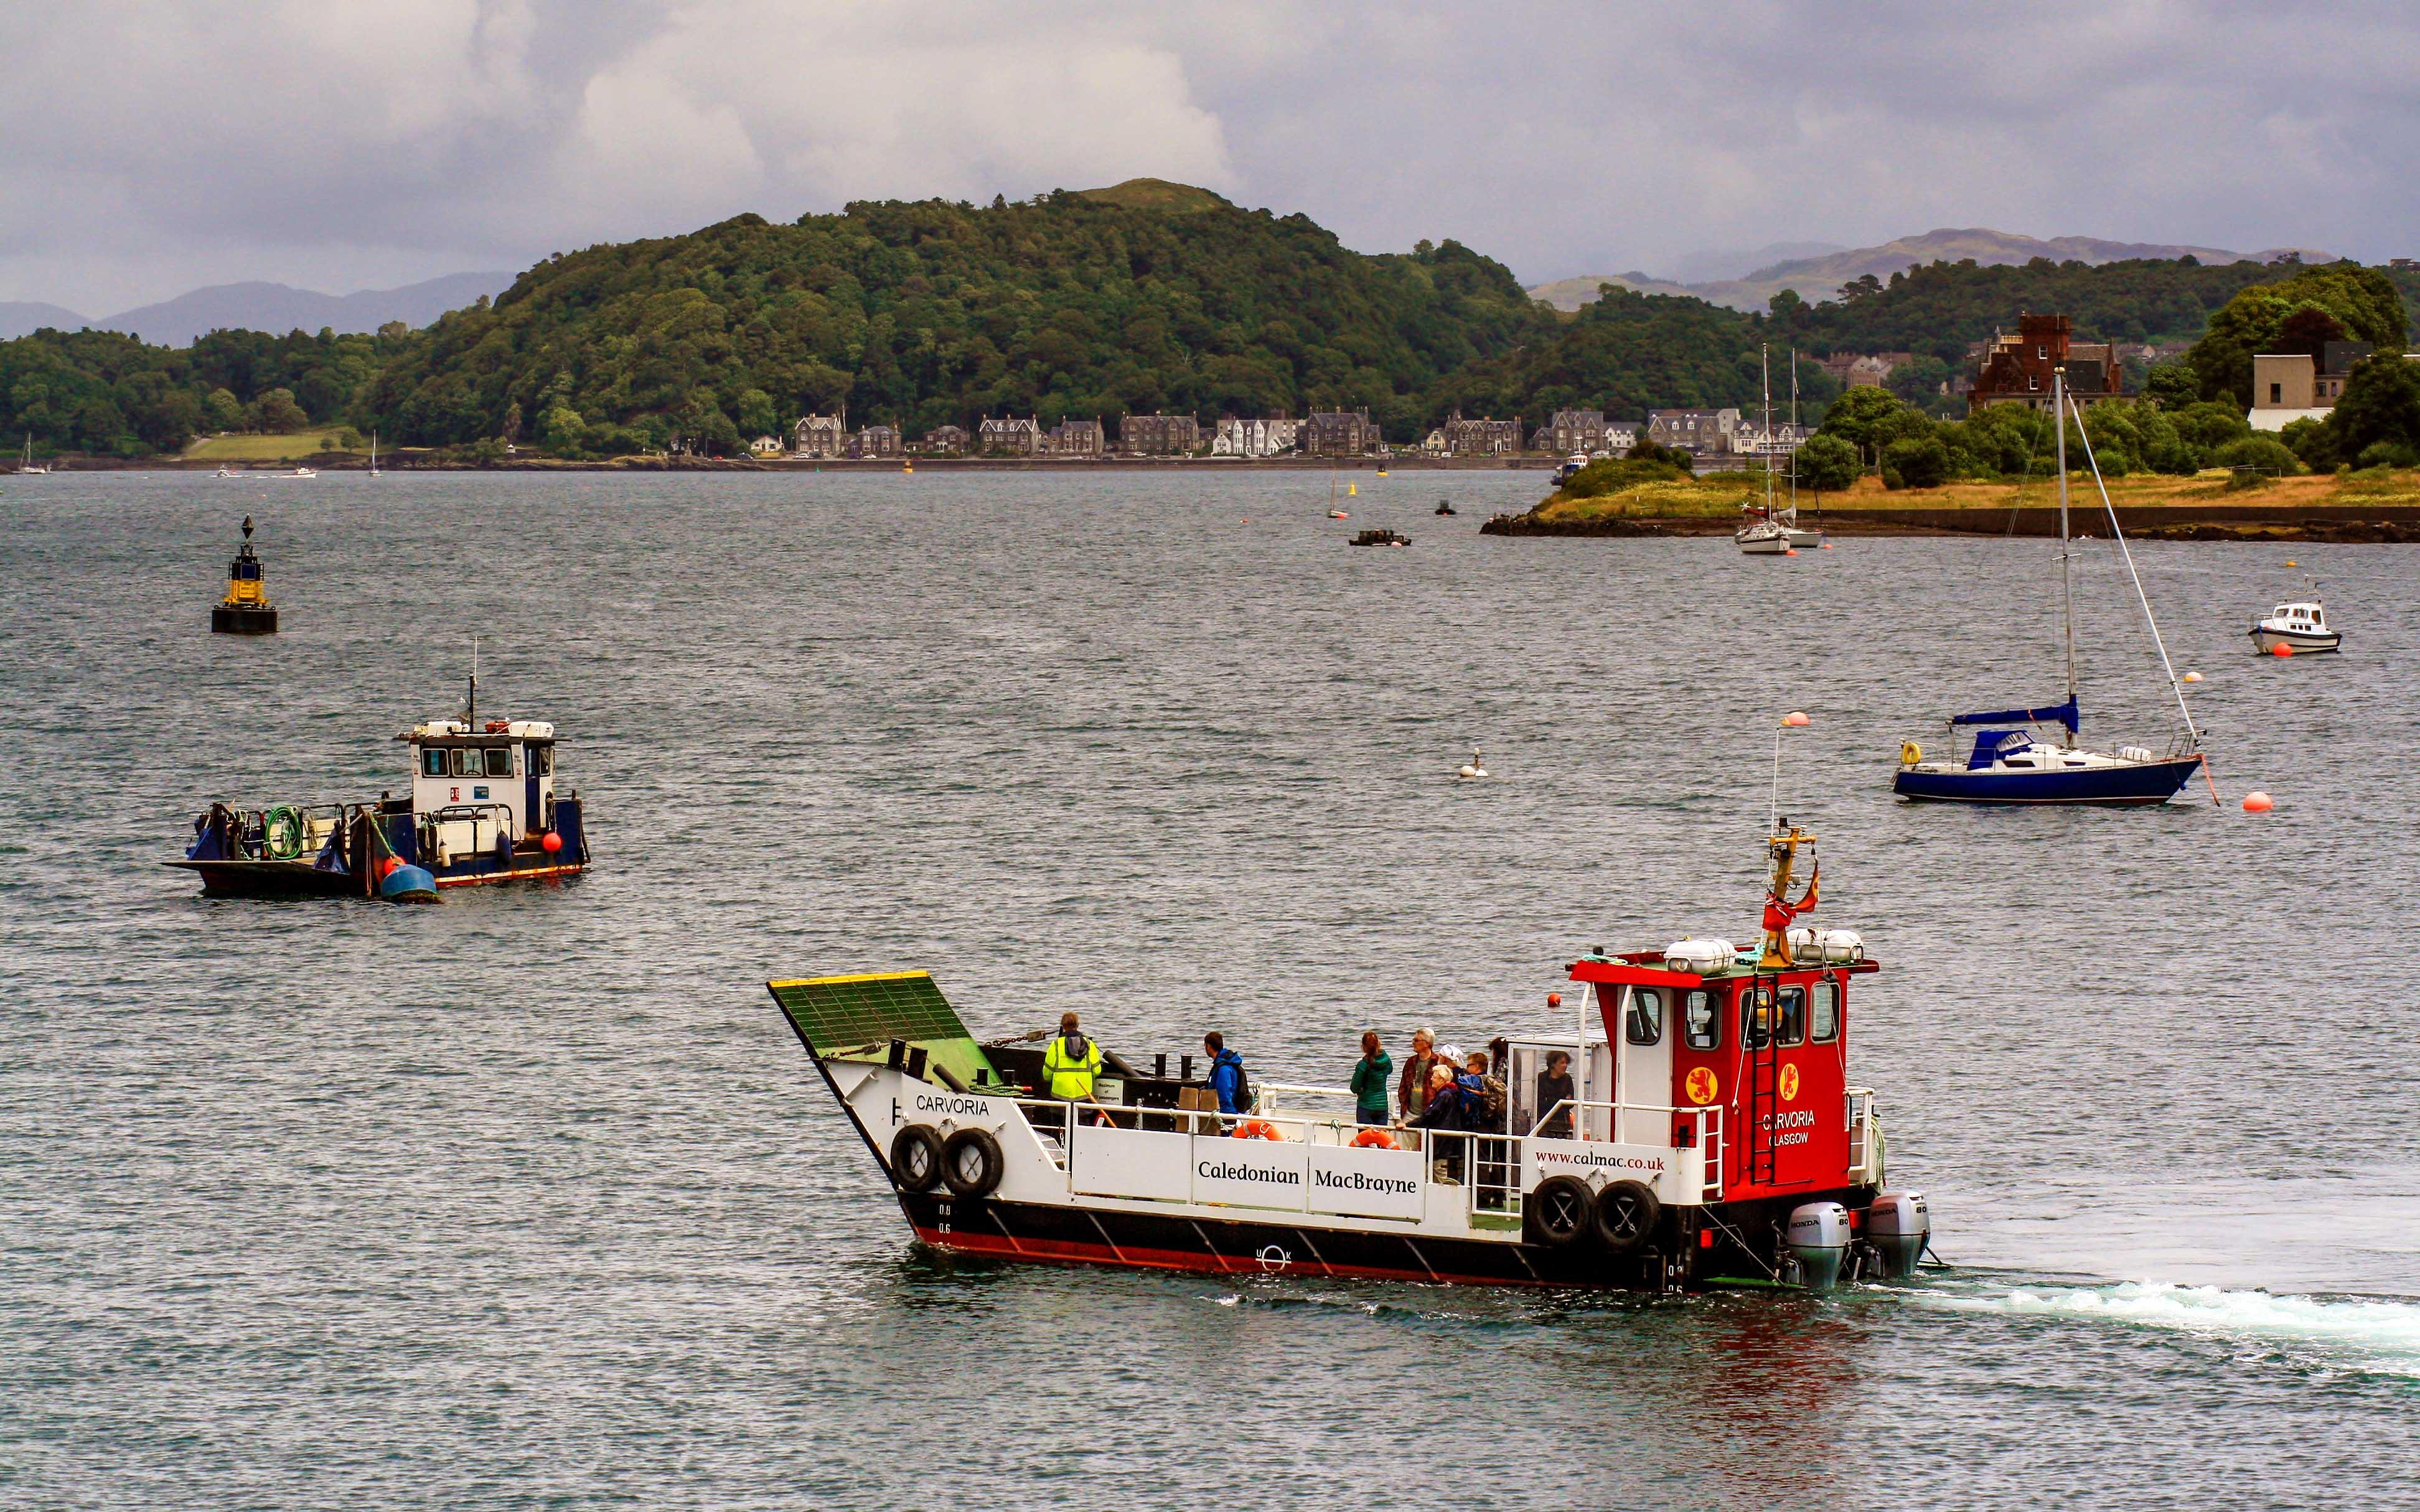 Carvoria passing previous ferry Gylen Lady (Photo: SoC Crew)